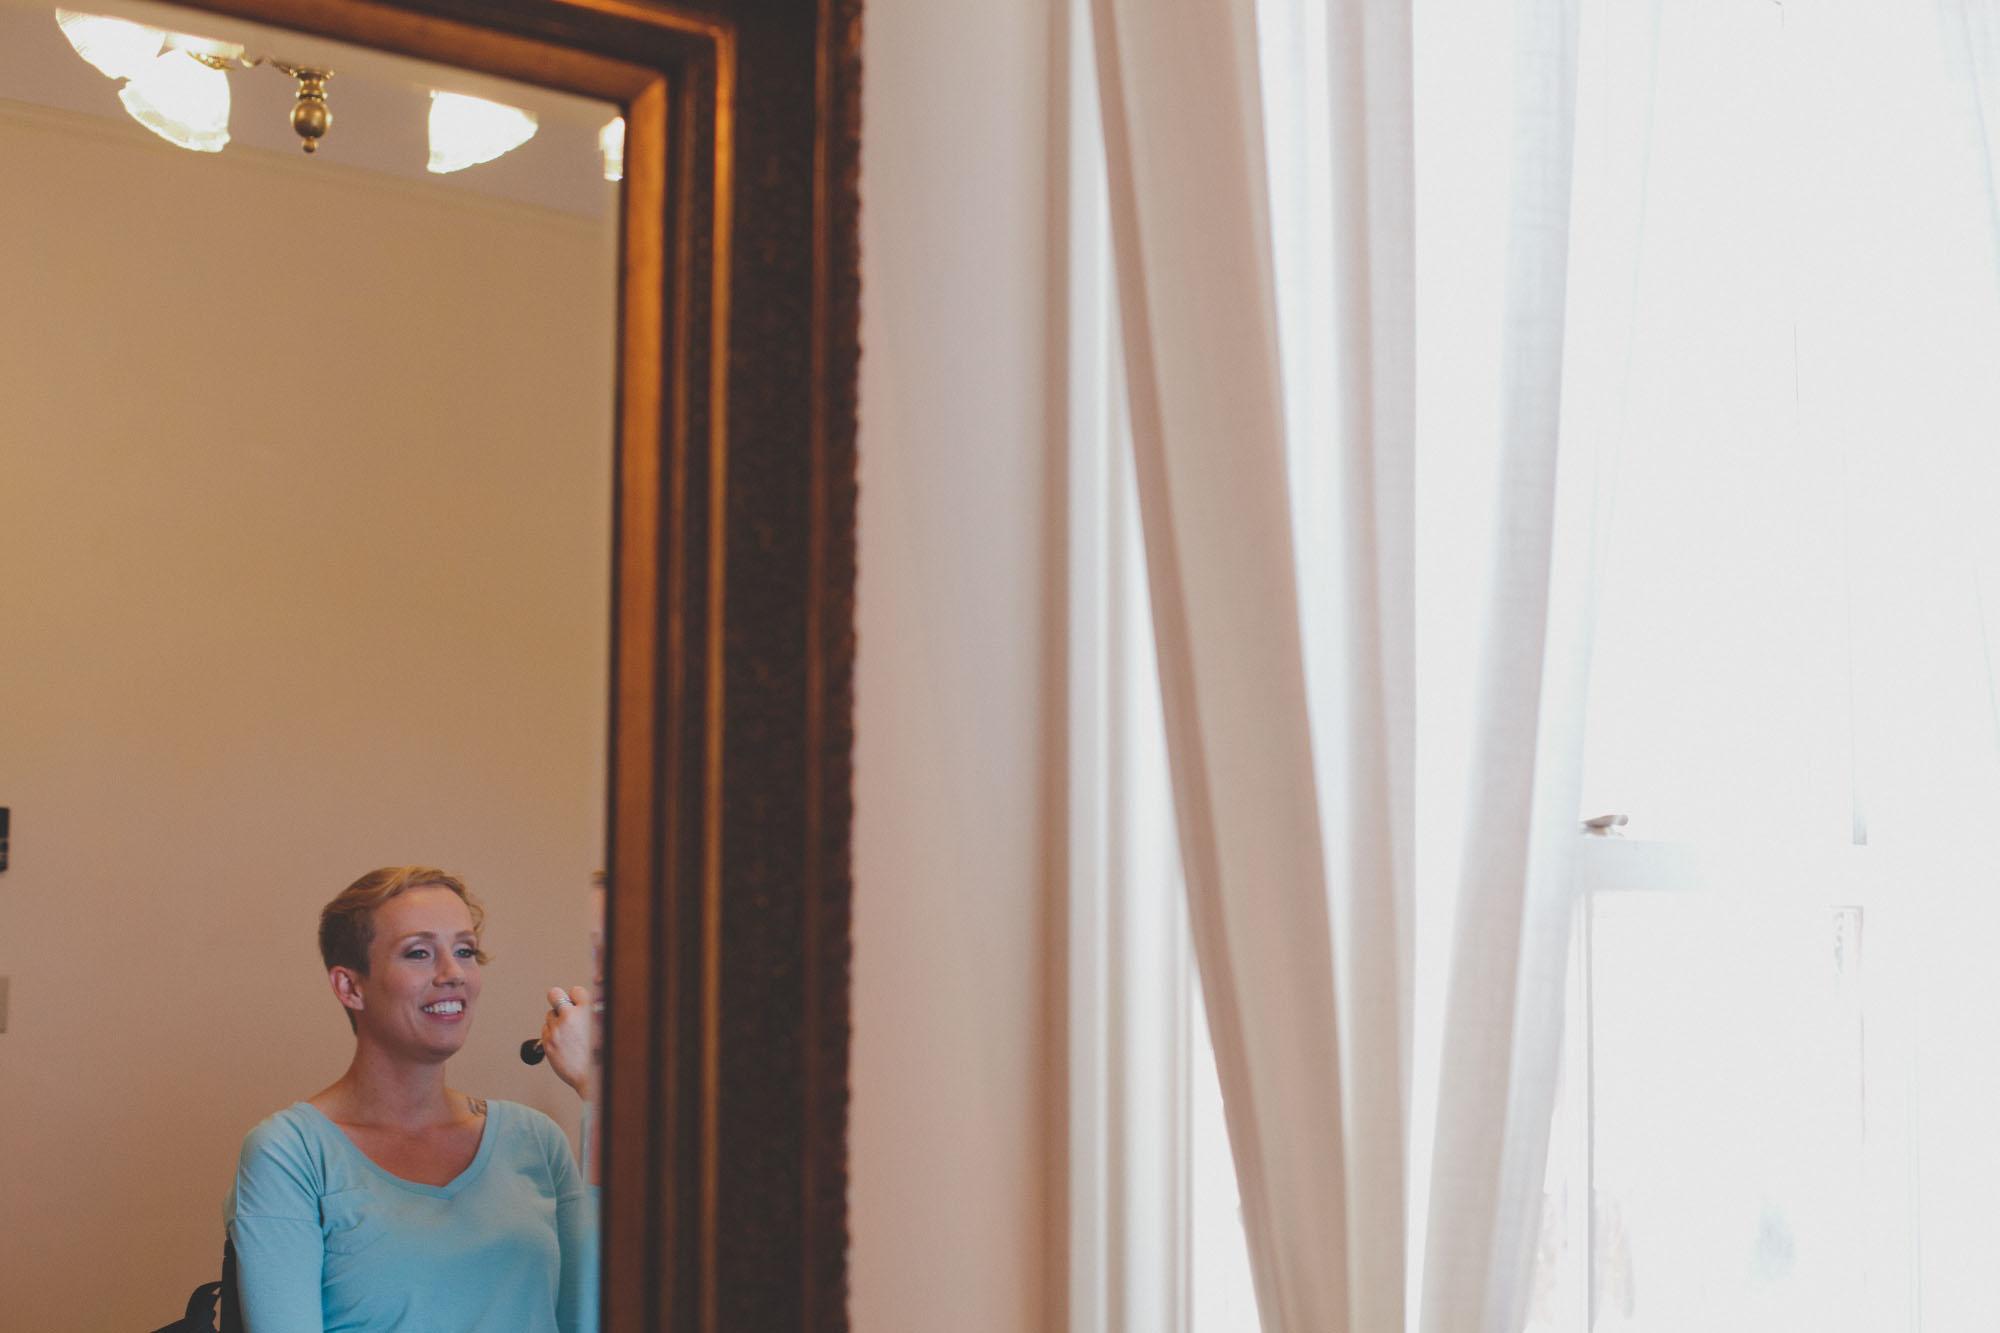 Gretchen_Gause_Petaluma_Olympias_Valley_Wedding_Photo-035.jpg